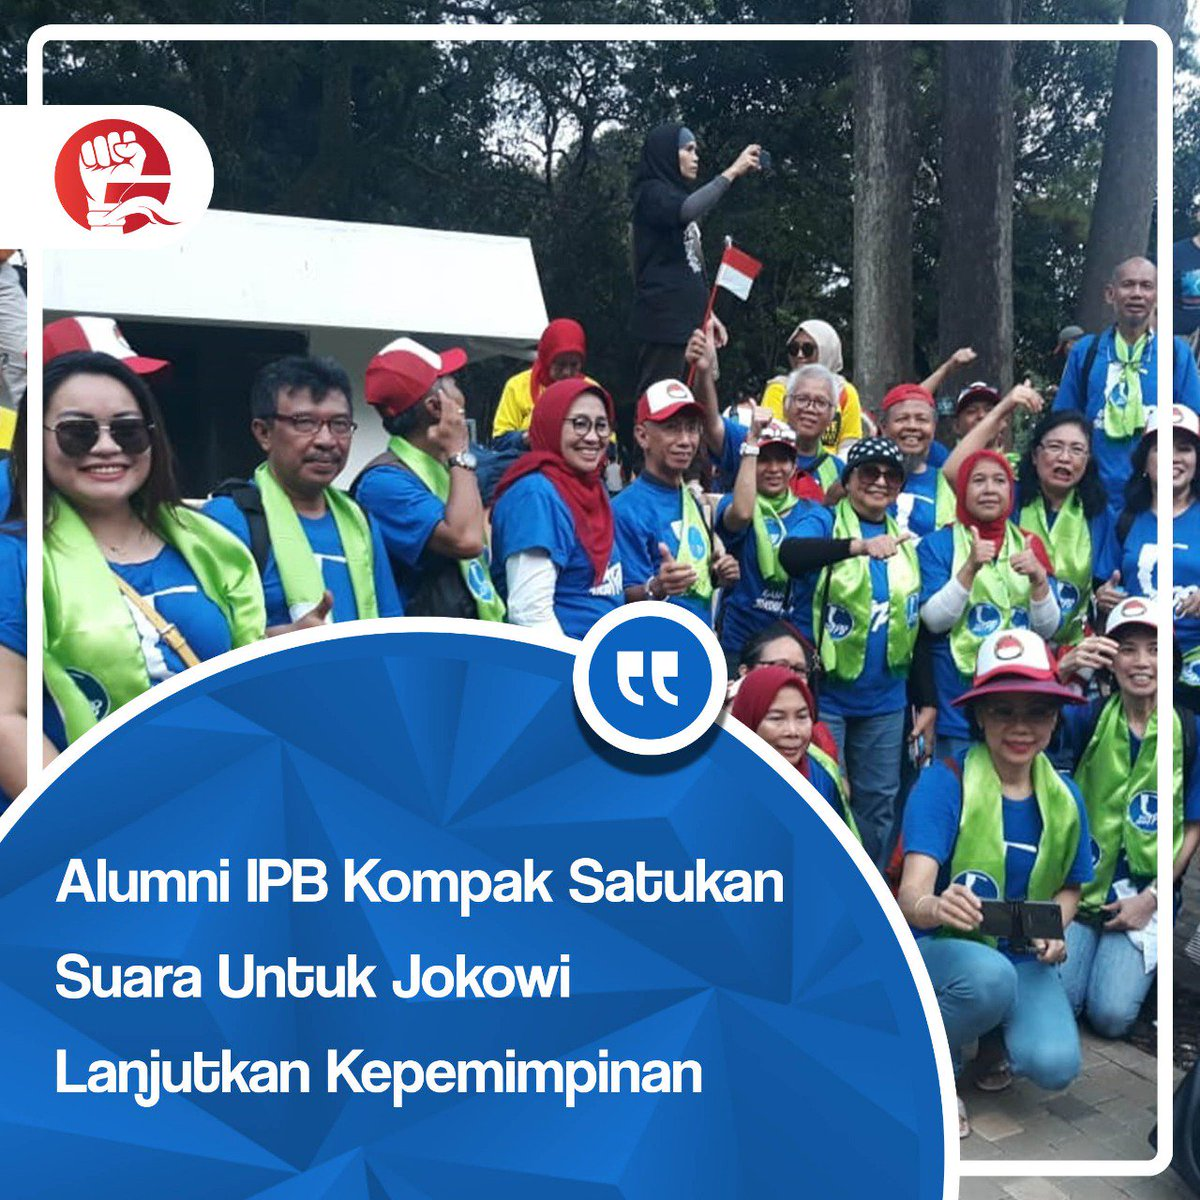 #jokowipresidenku #rekanjokowi #rekanjokowisulsel #ayoteruskerja #indonesiakuat https://t.co/bsDTkoPVeg